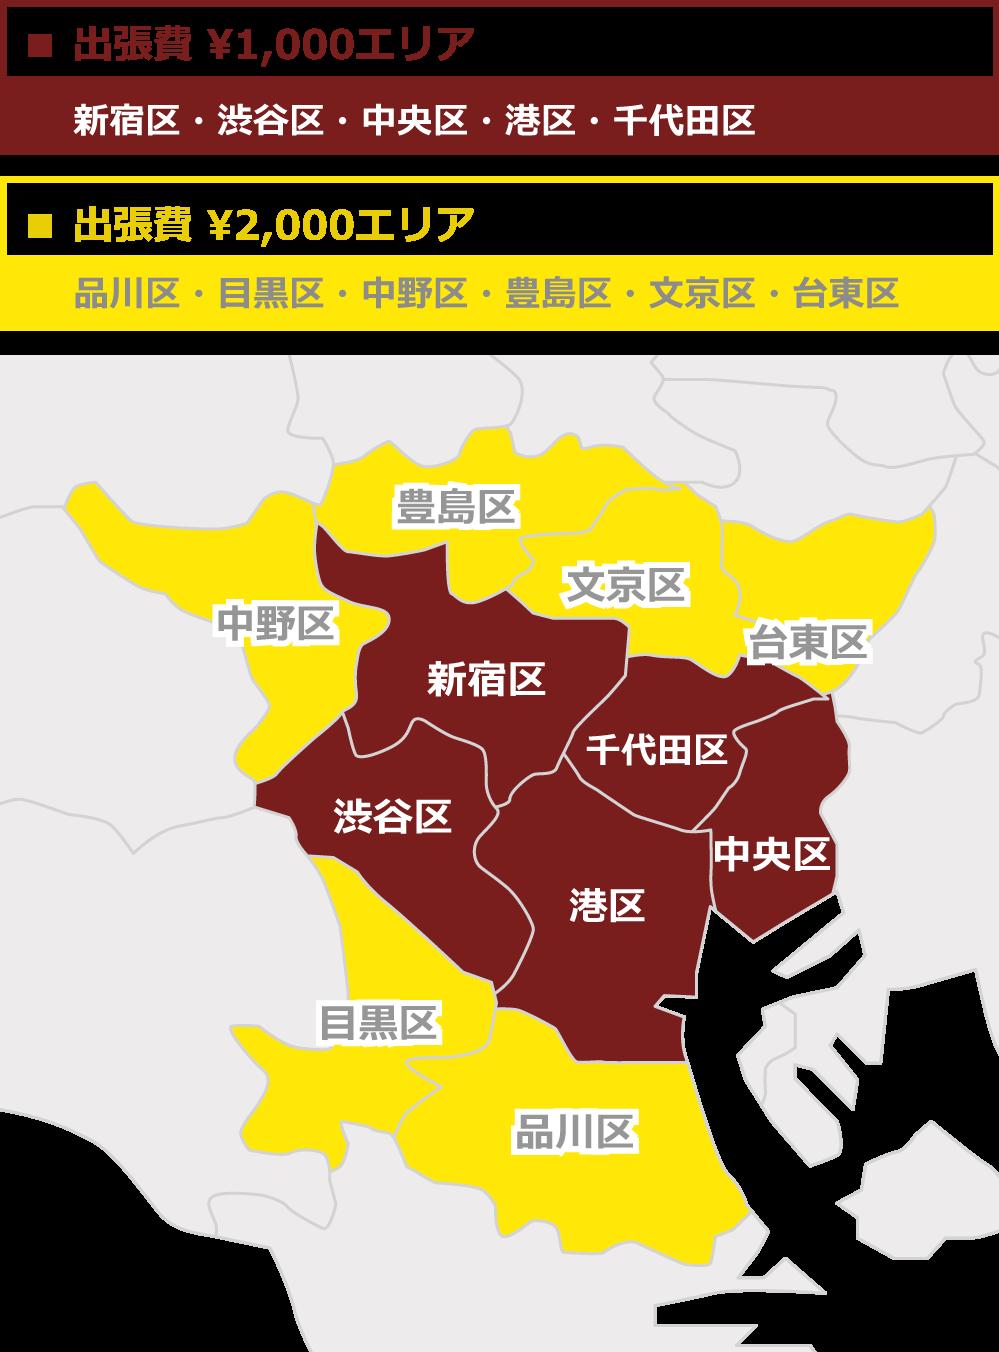 東京都内の出張費1000円~!